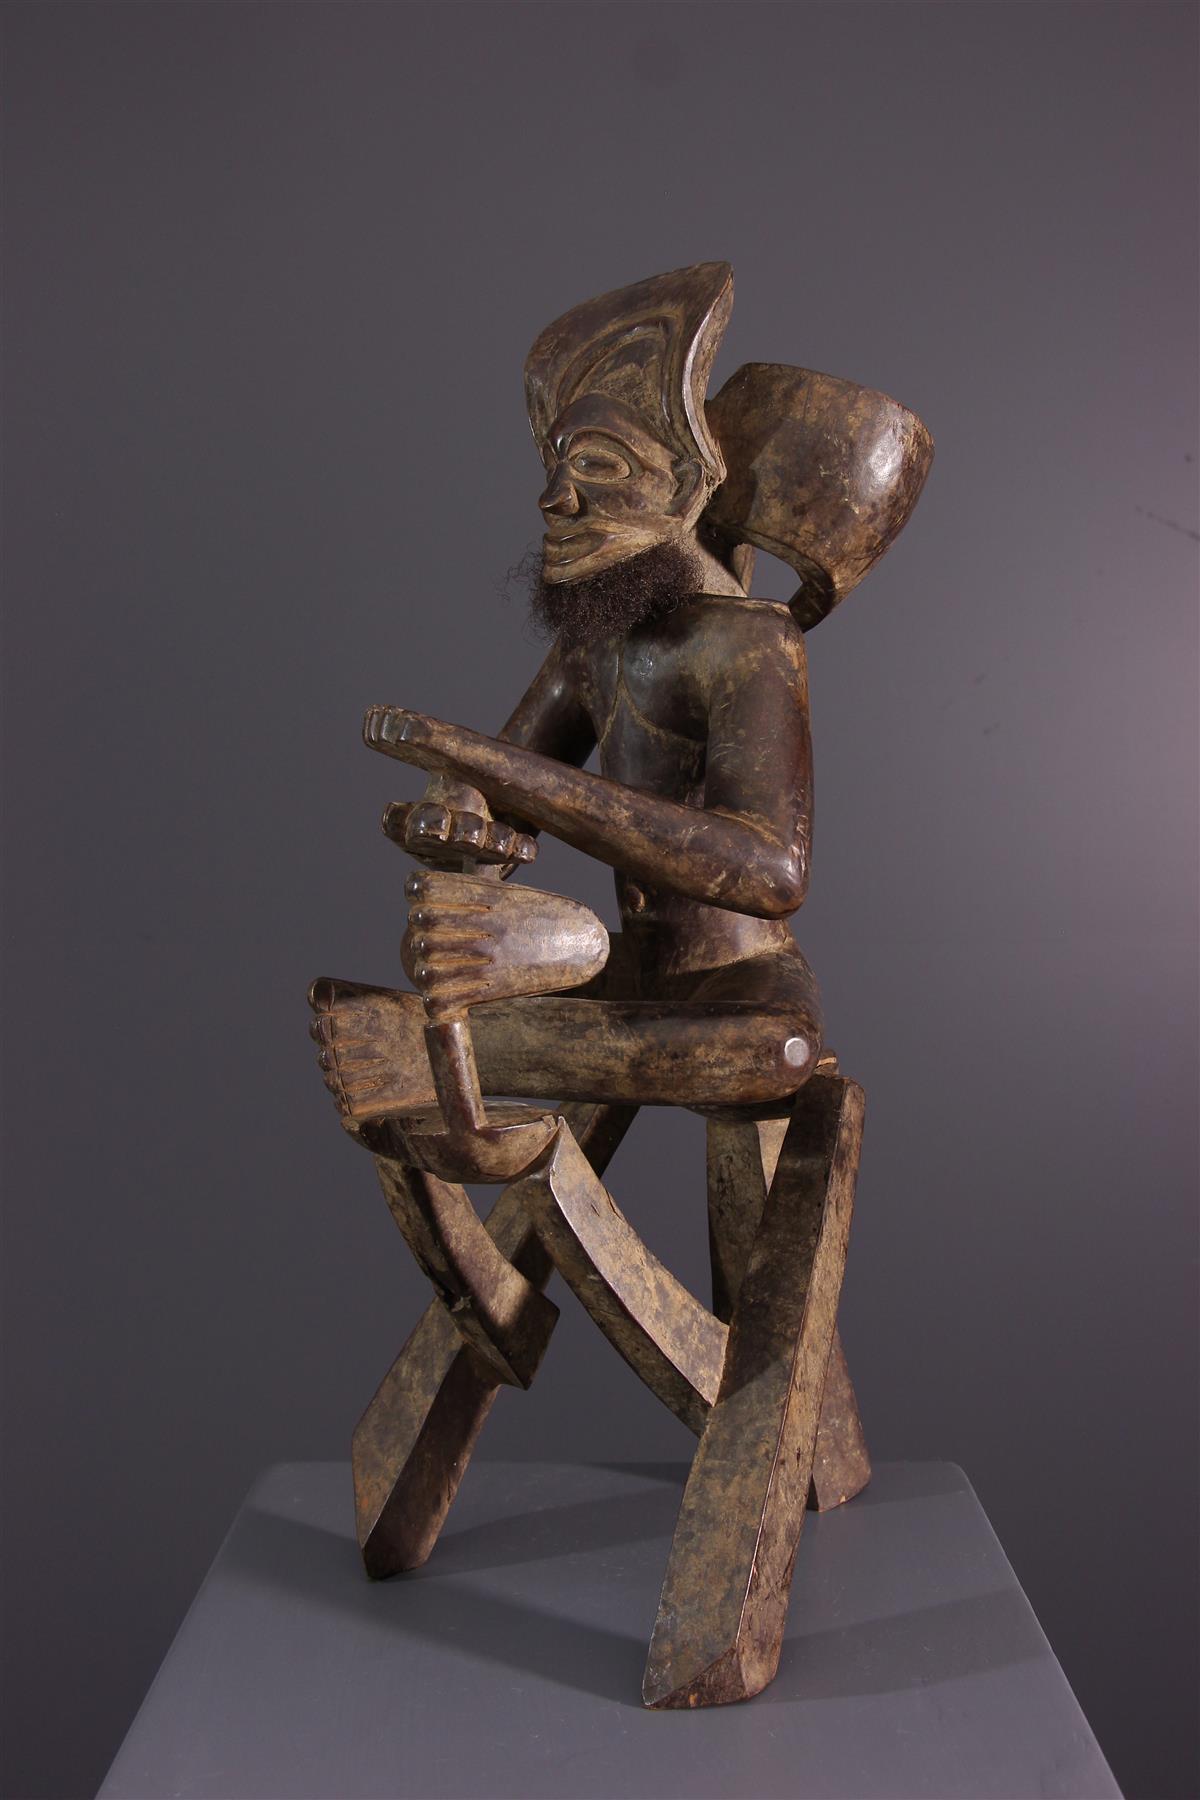 Statue Chokwe - African art